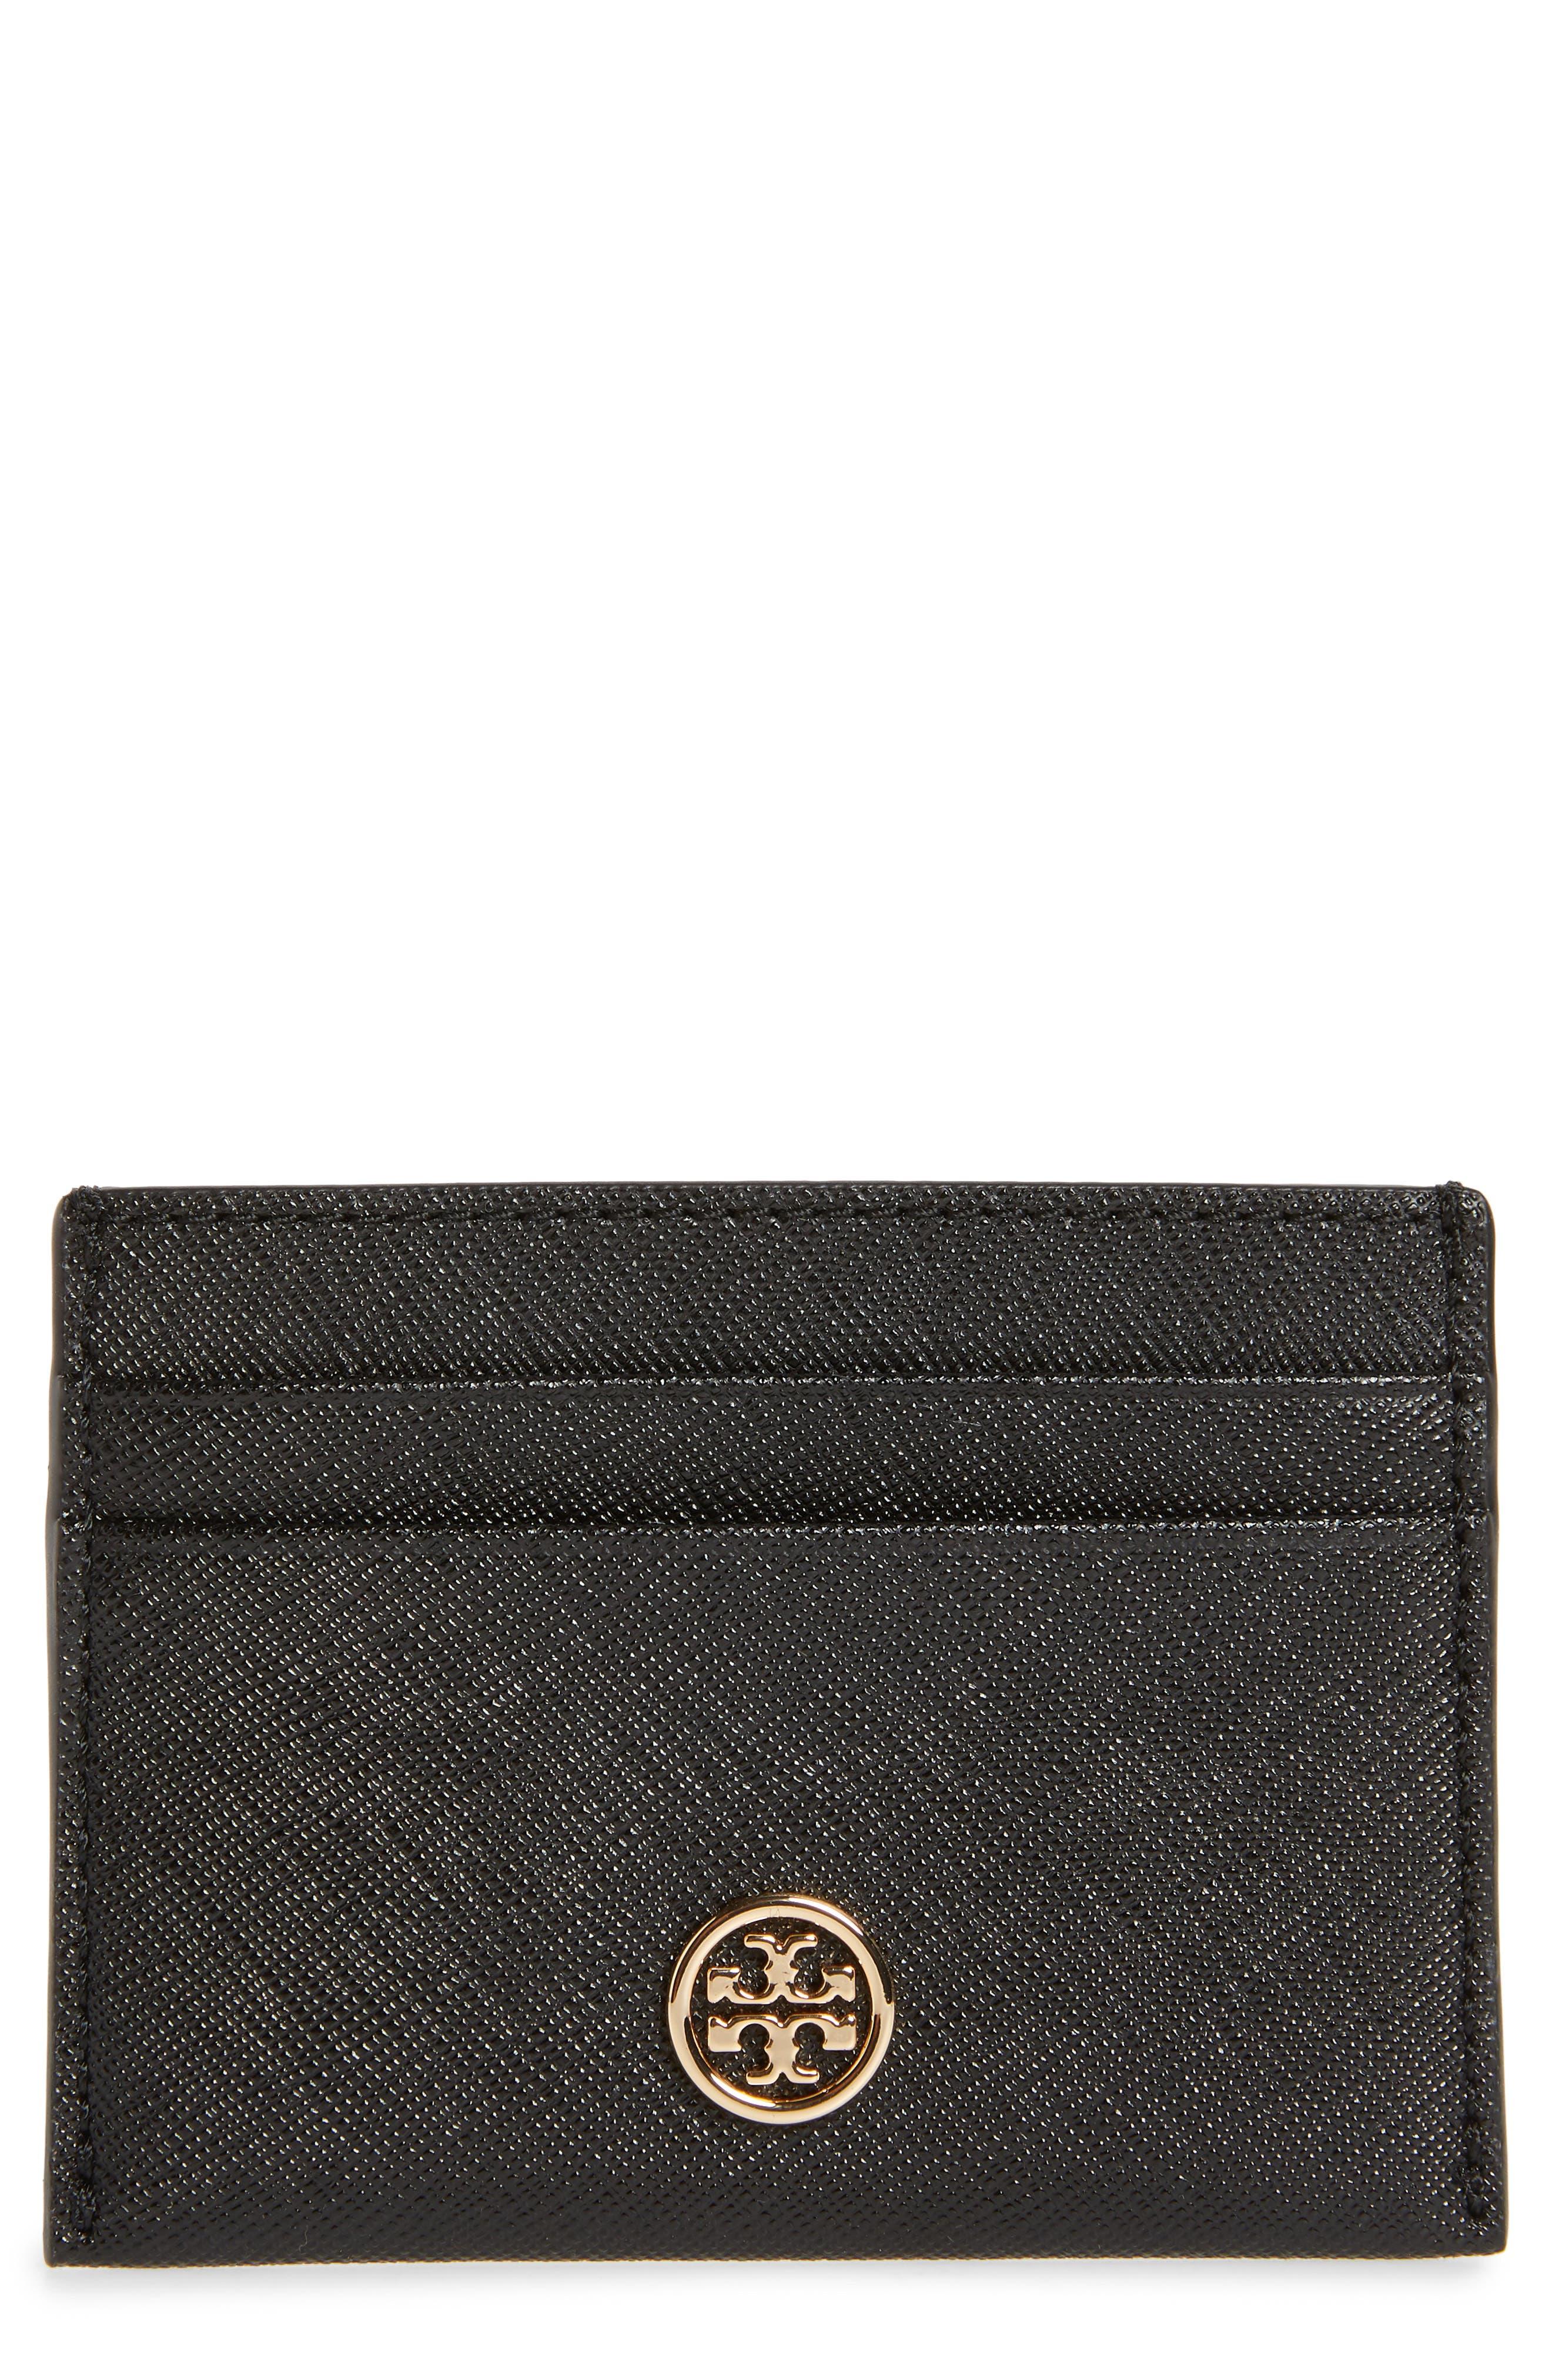 Robinson Leather Card Case,                             Main thumbnail 1, color,                             BLACK